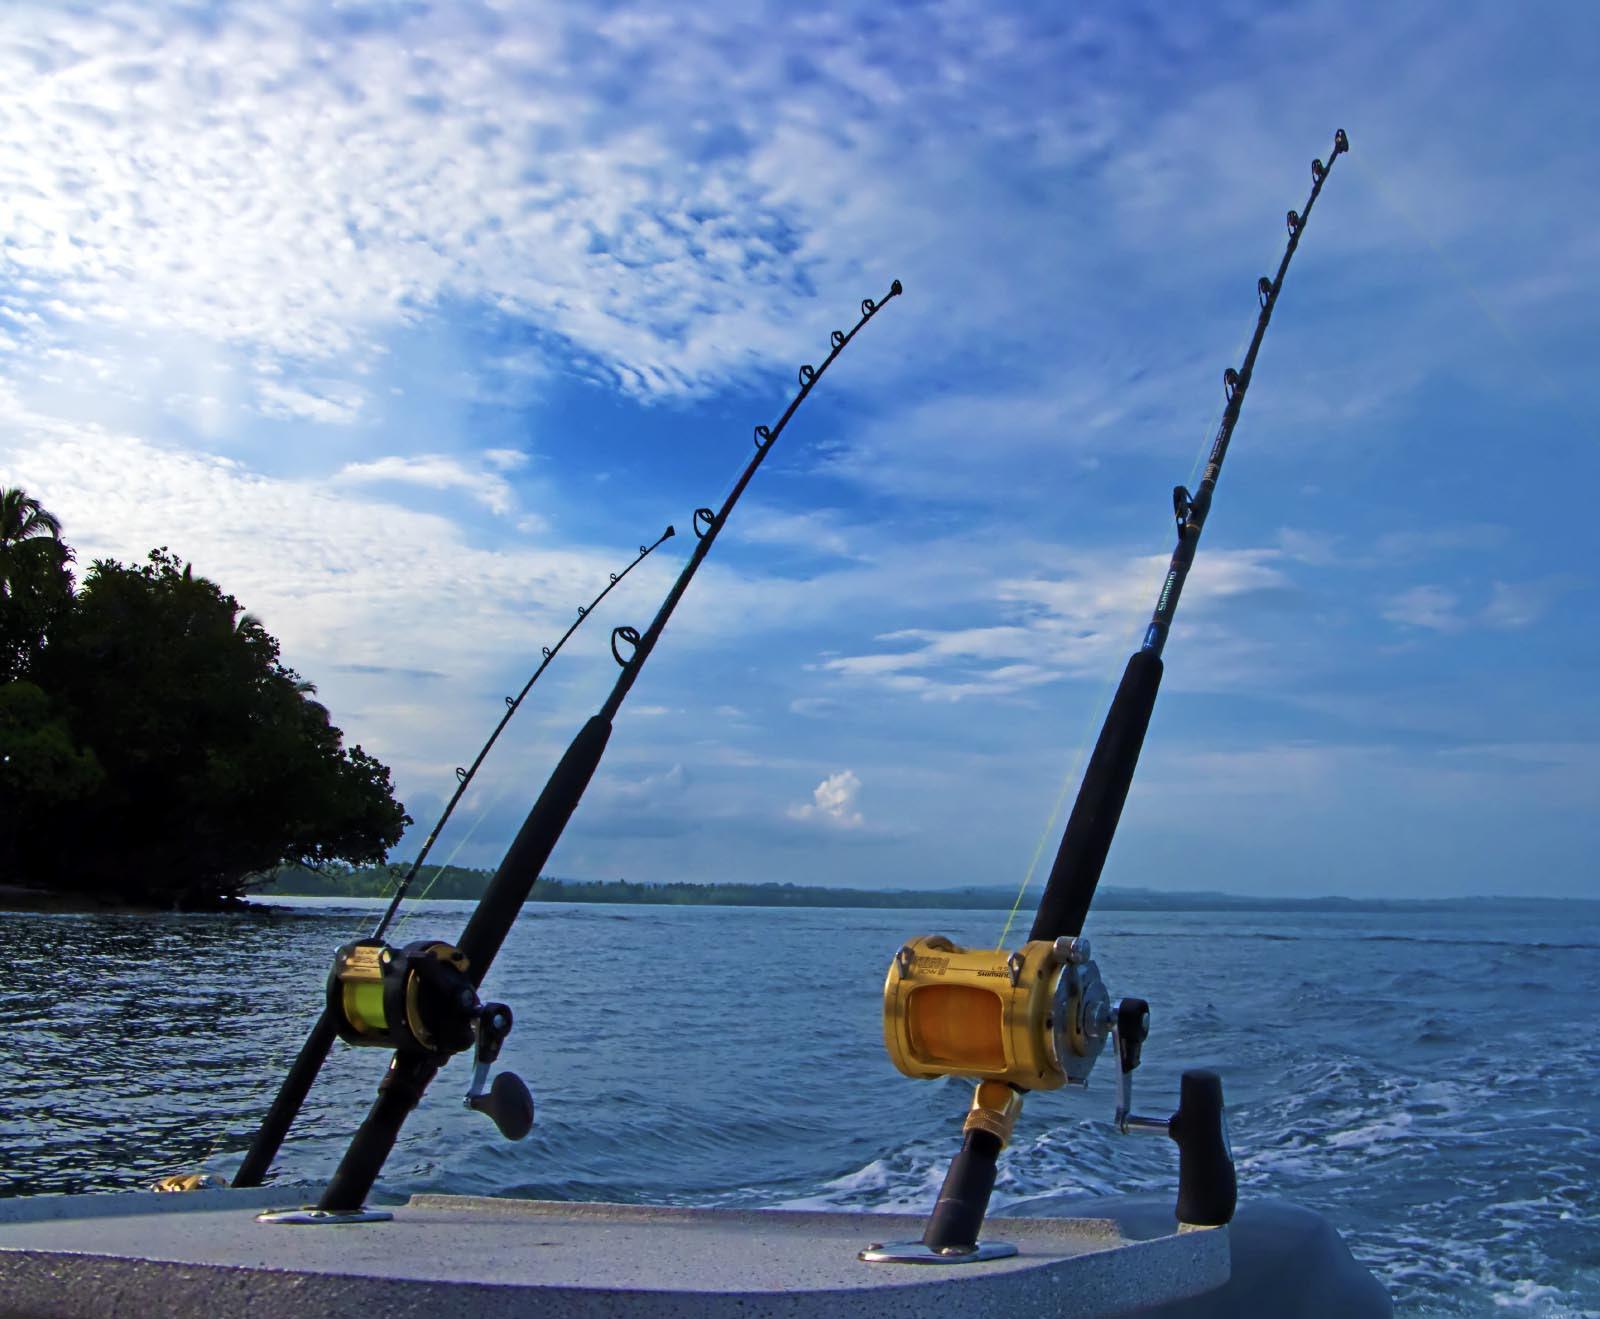 Fishing Pole Review Mei 2017